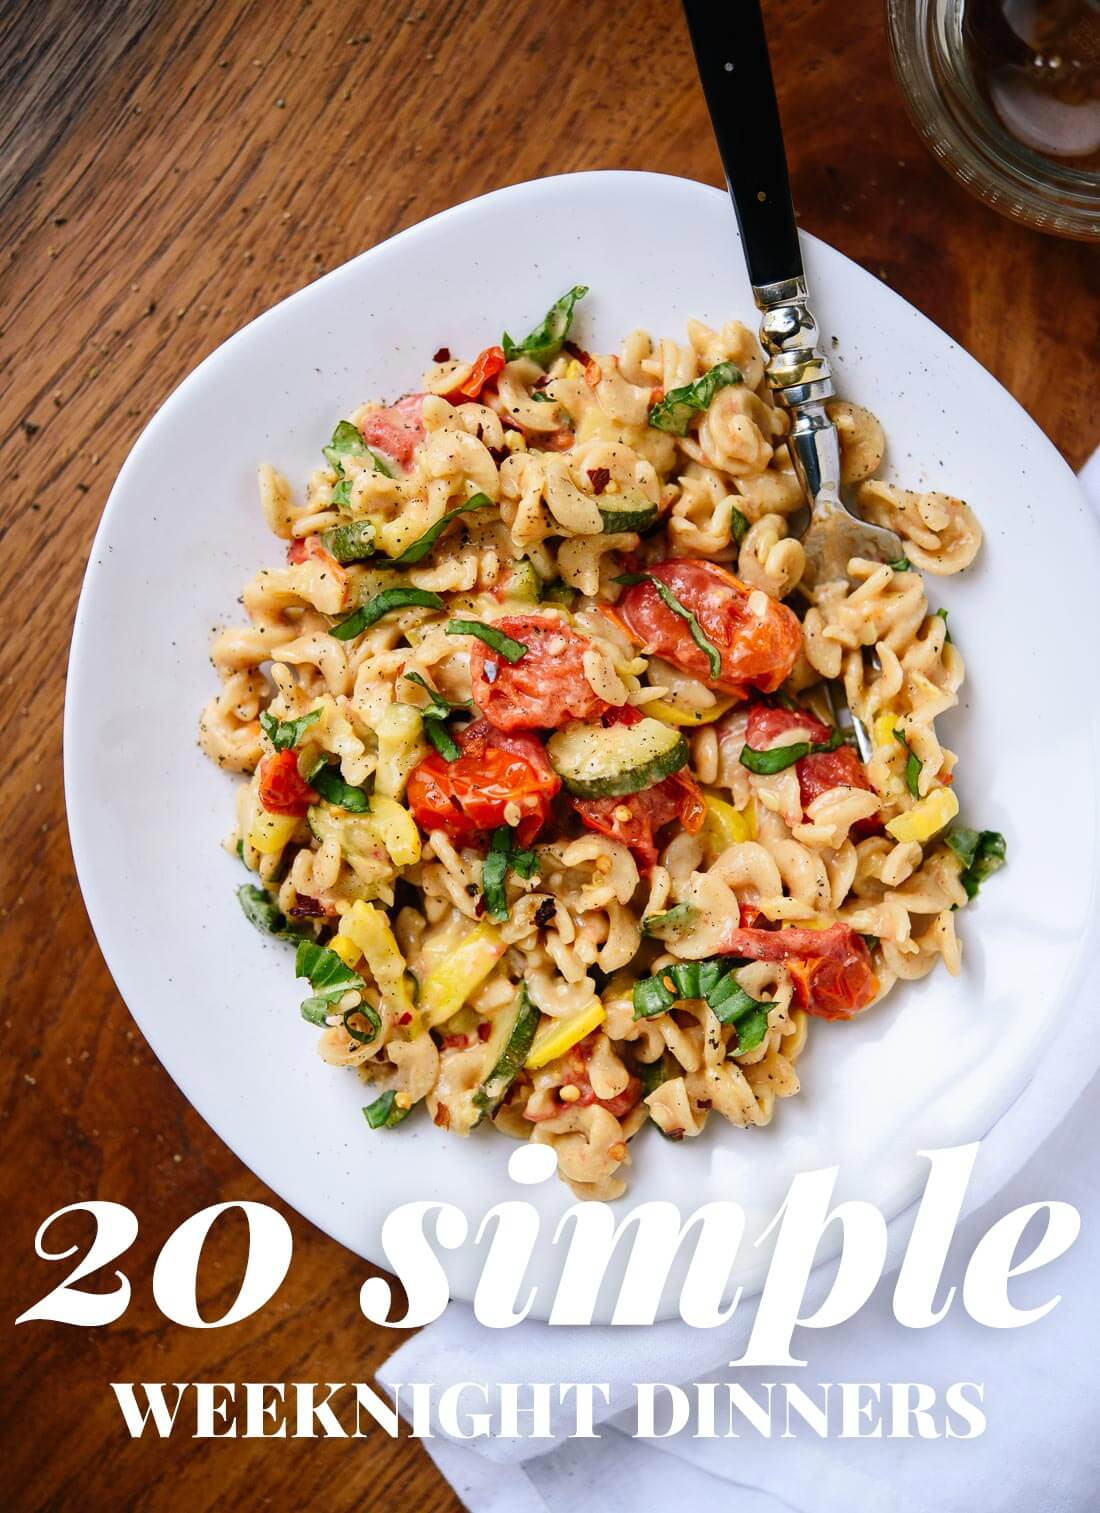 Healthy Vegetarian Dinner Ideas  20 Simple Ve arian Dinner Recipes Cookie and Kate